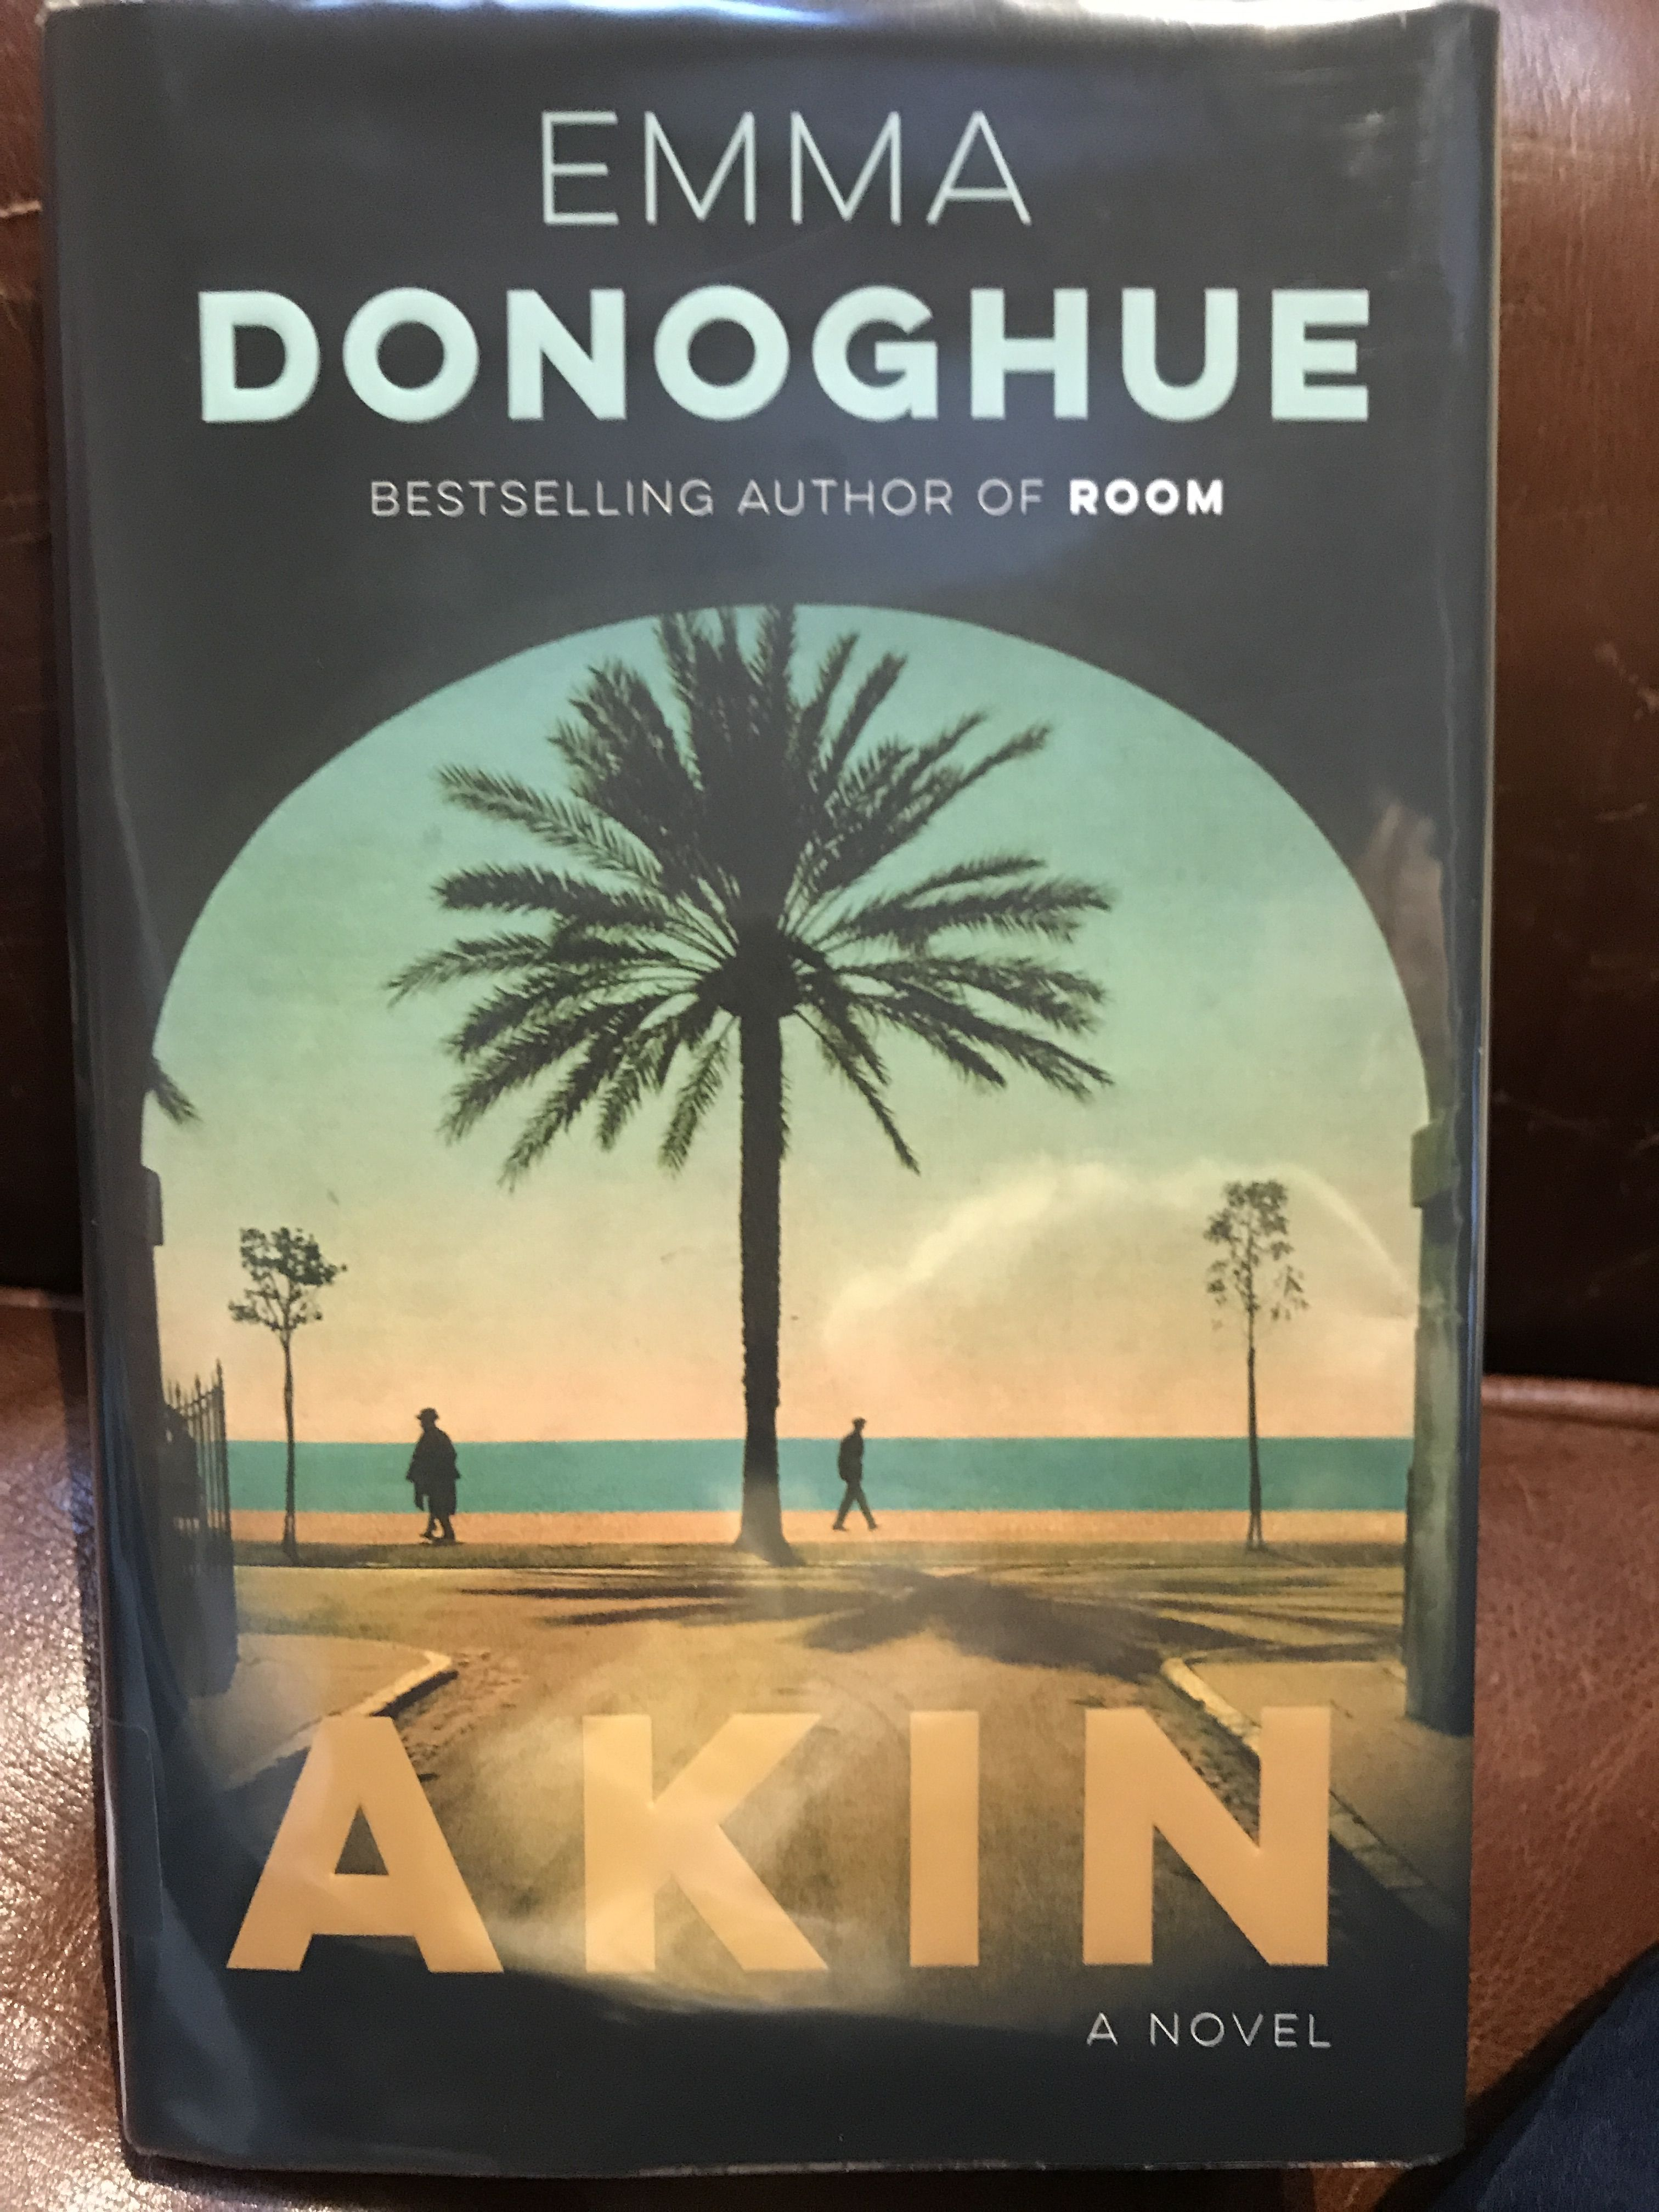 Akin by emma donoghue emma donoghue bestselling author